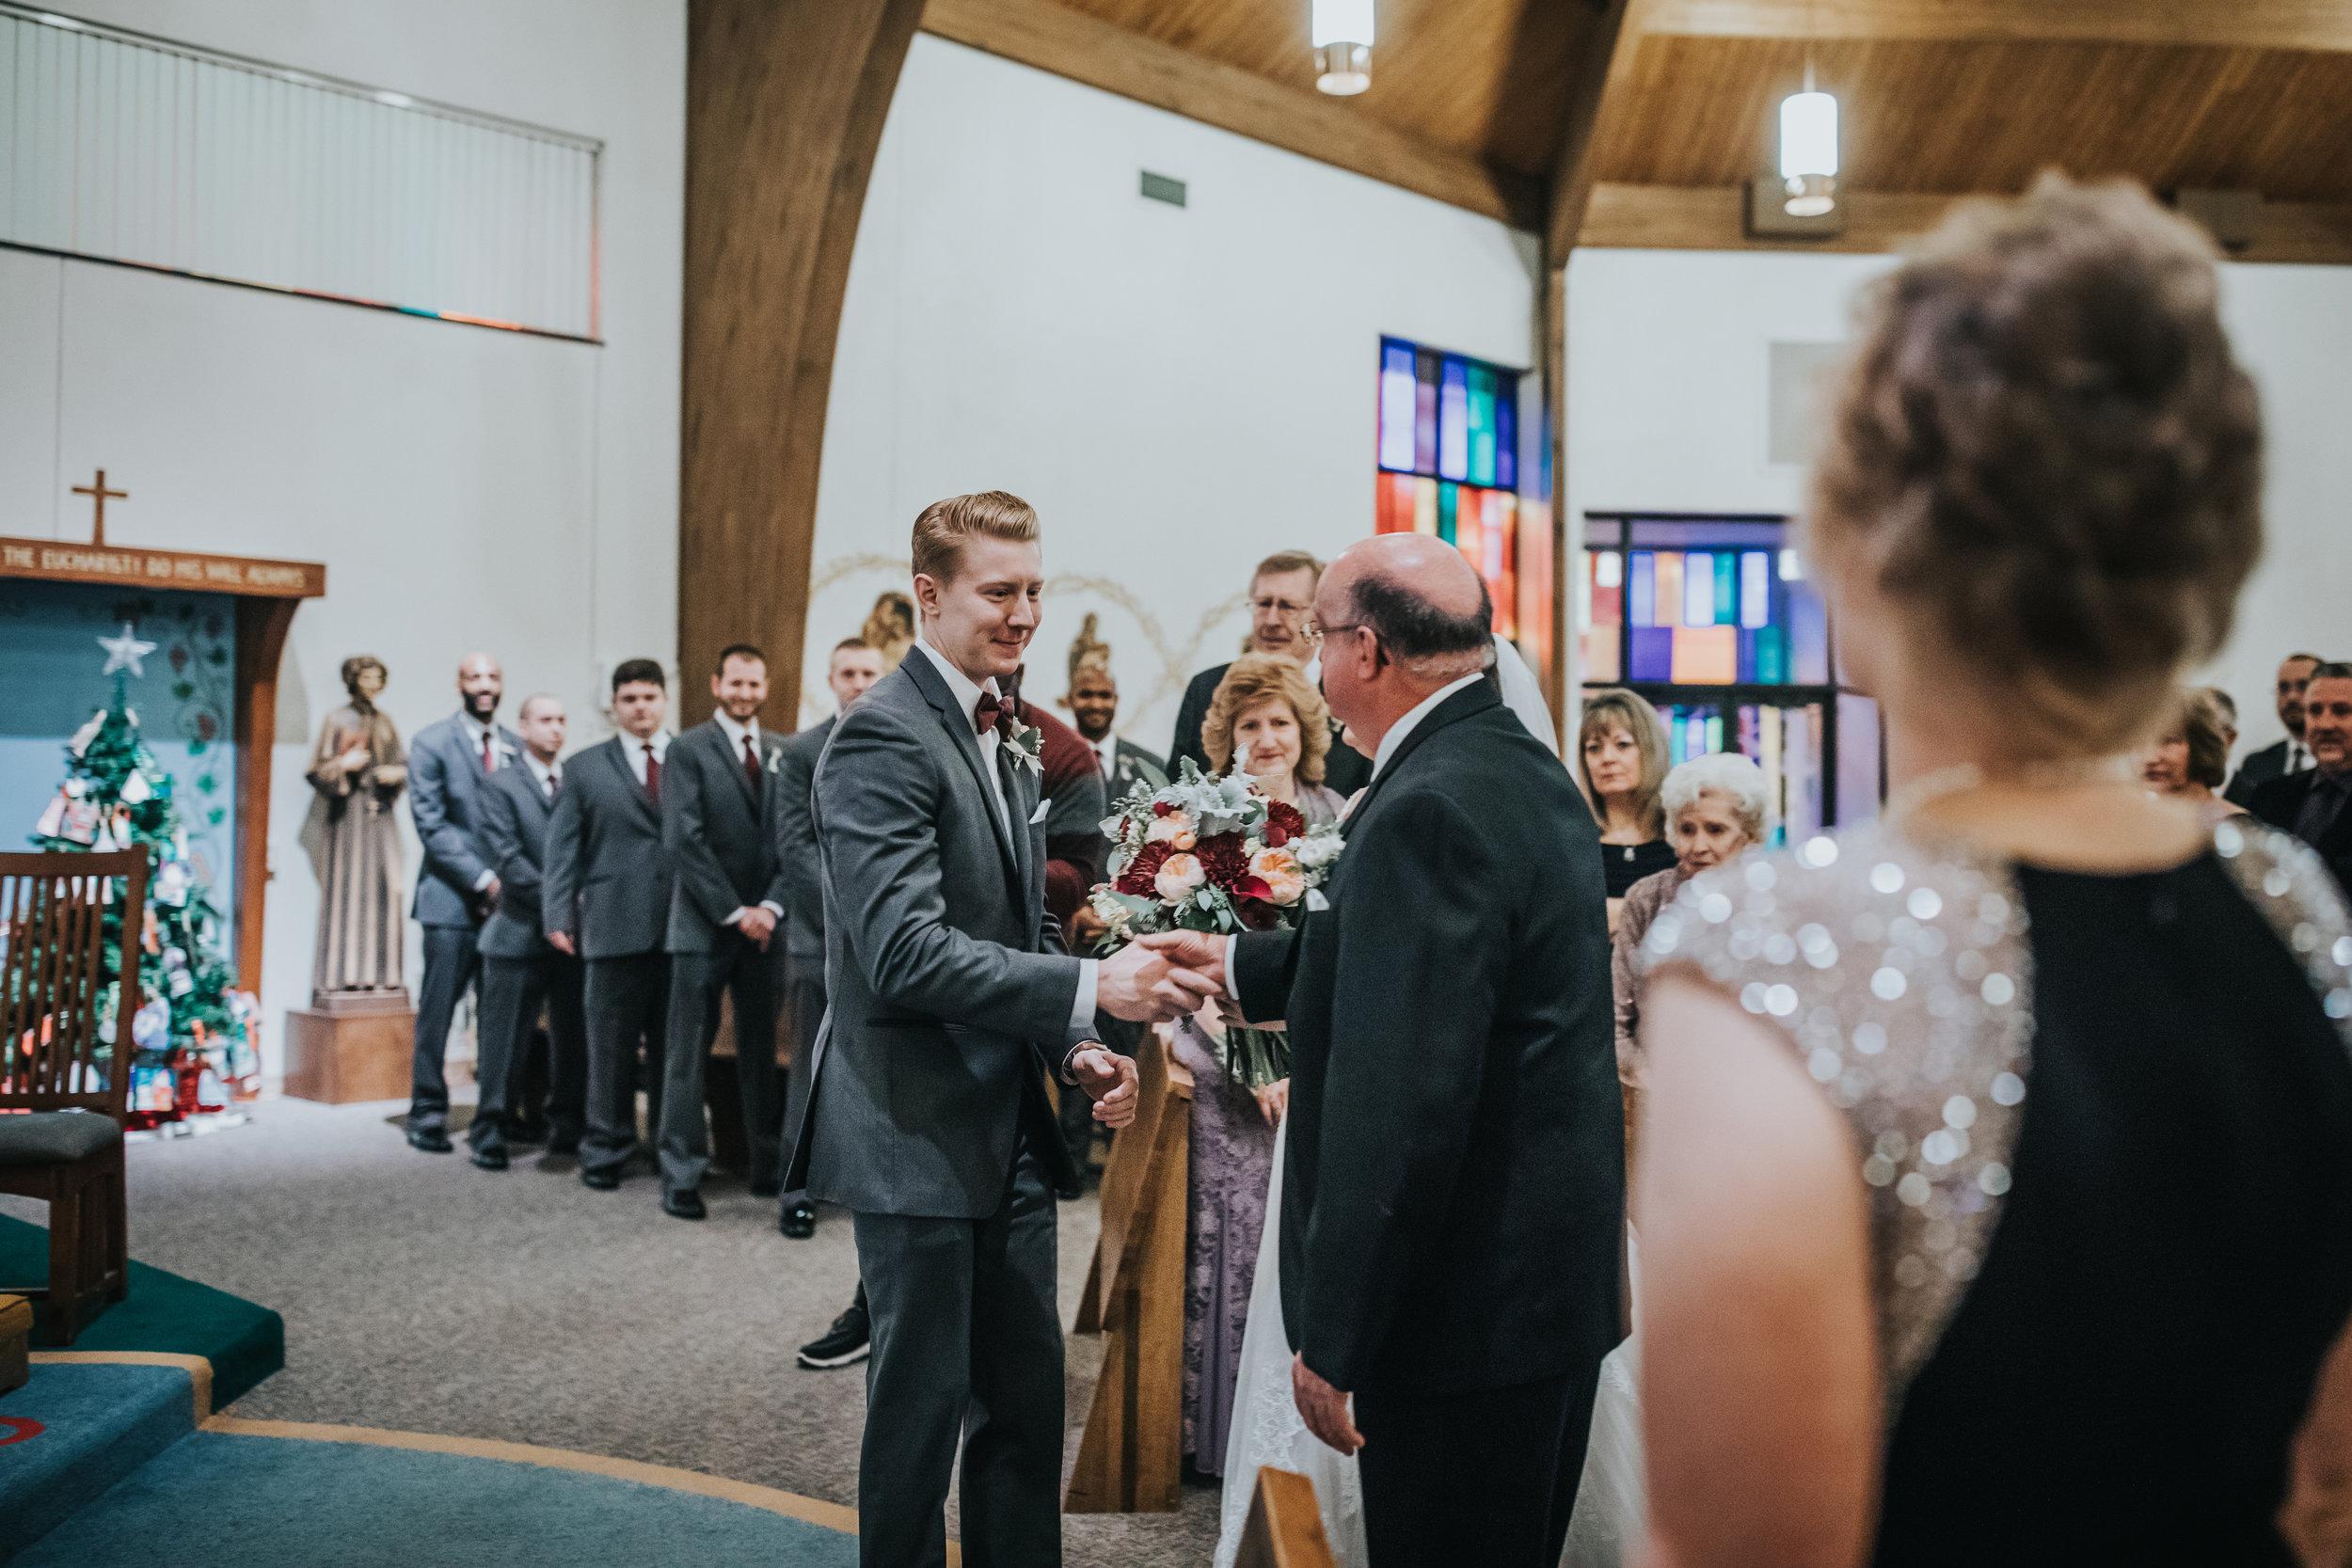 New-Jersey-Wedding-Photography-Fishers-Tudor-House-JennaLynnPhotography-Ceremony-Kathleen&Eddie-19.jpg